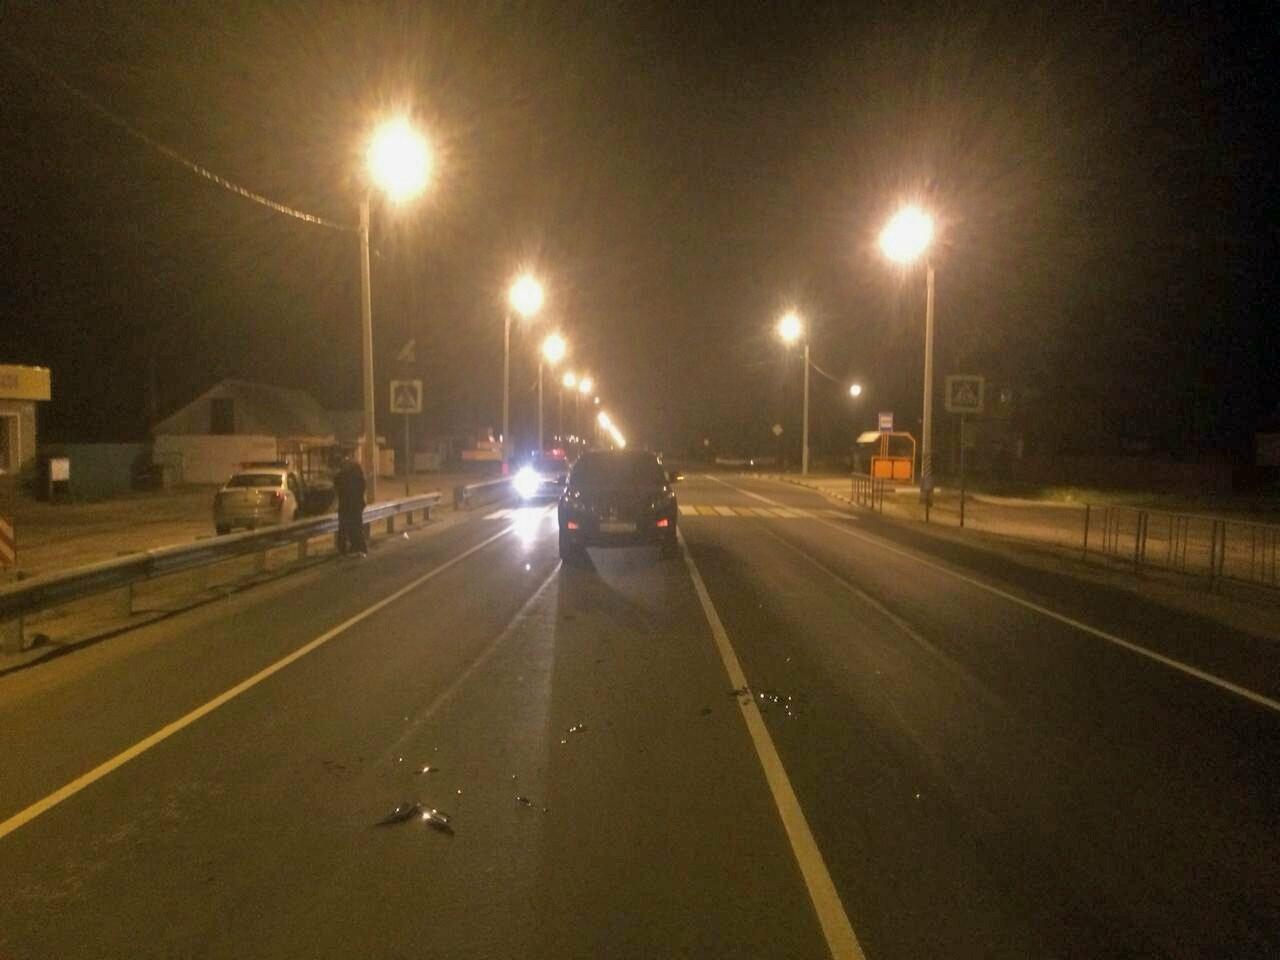 Тамбовчанин на пешеходном переходе насмерть сбил пенсионерку, фото-2